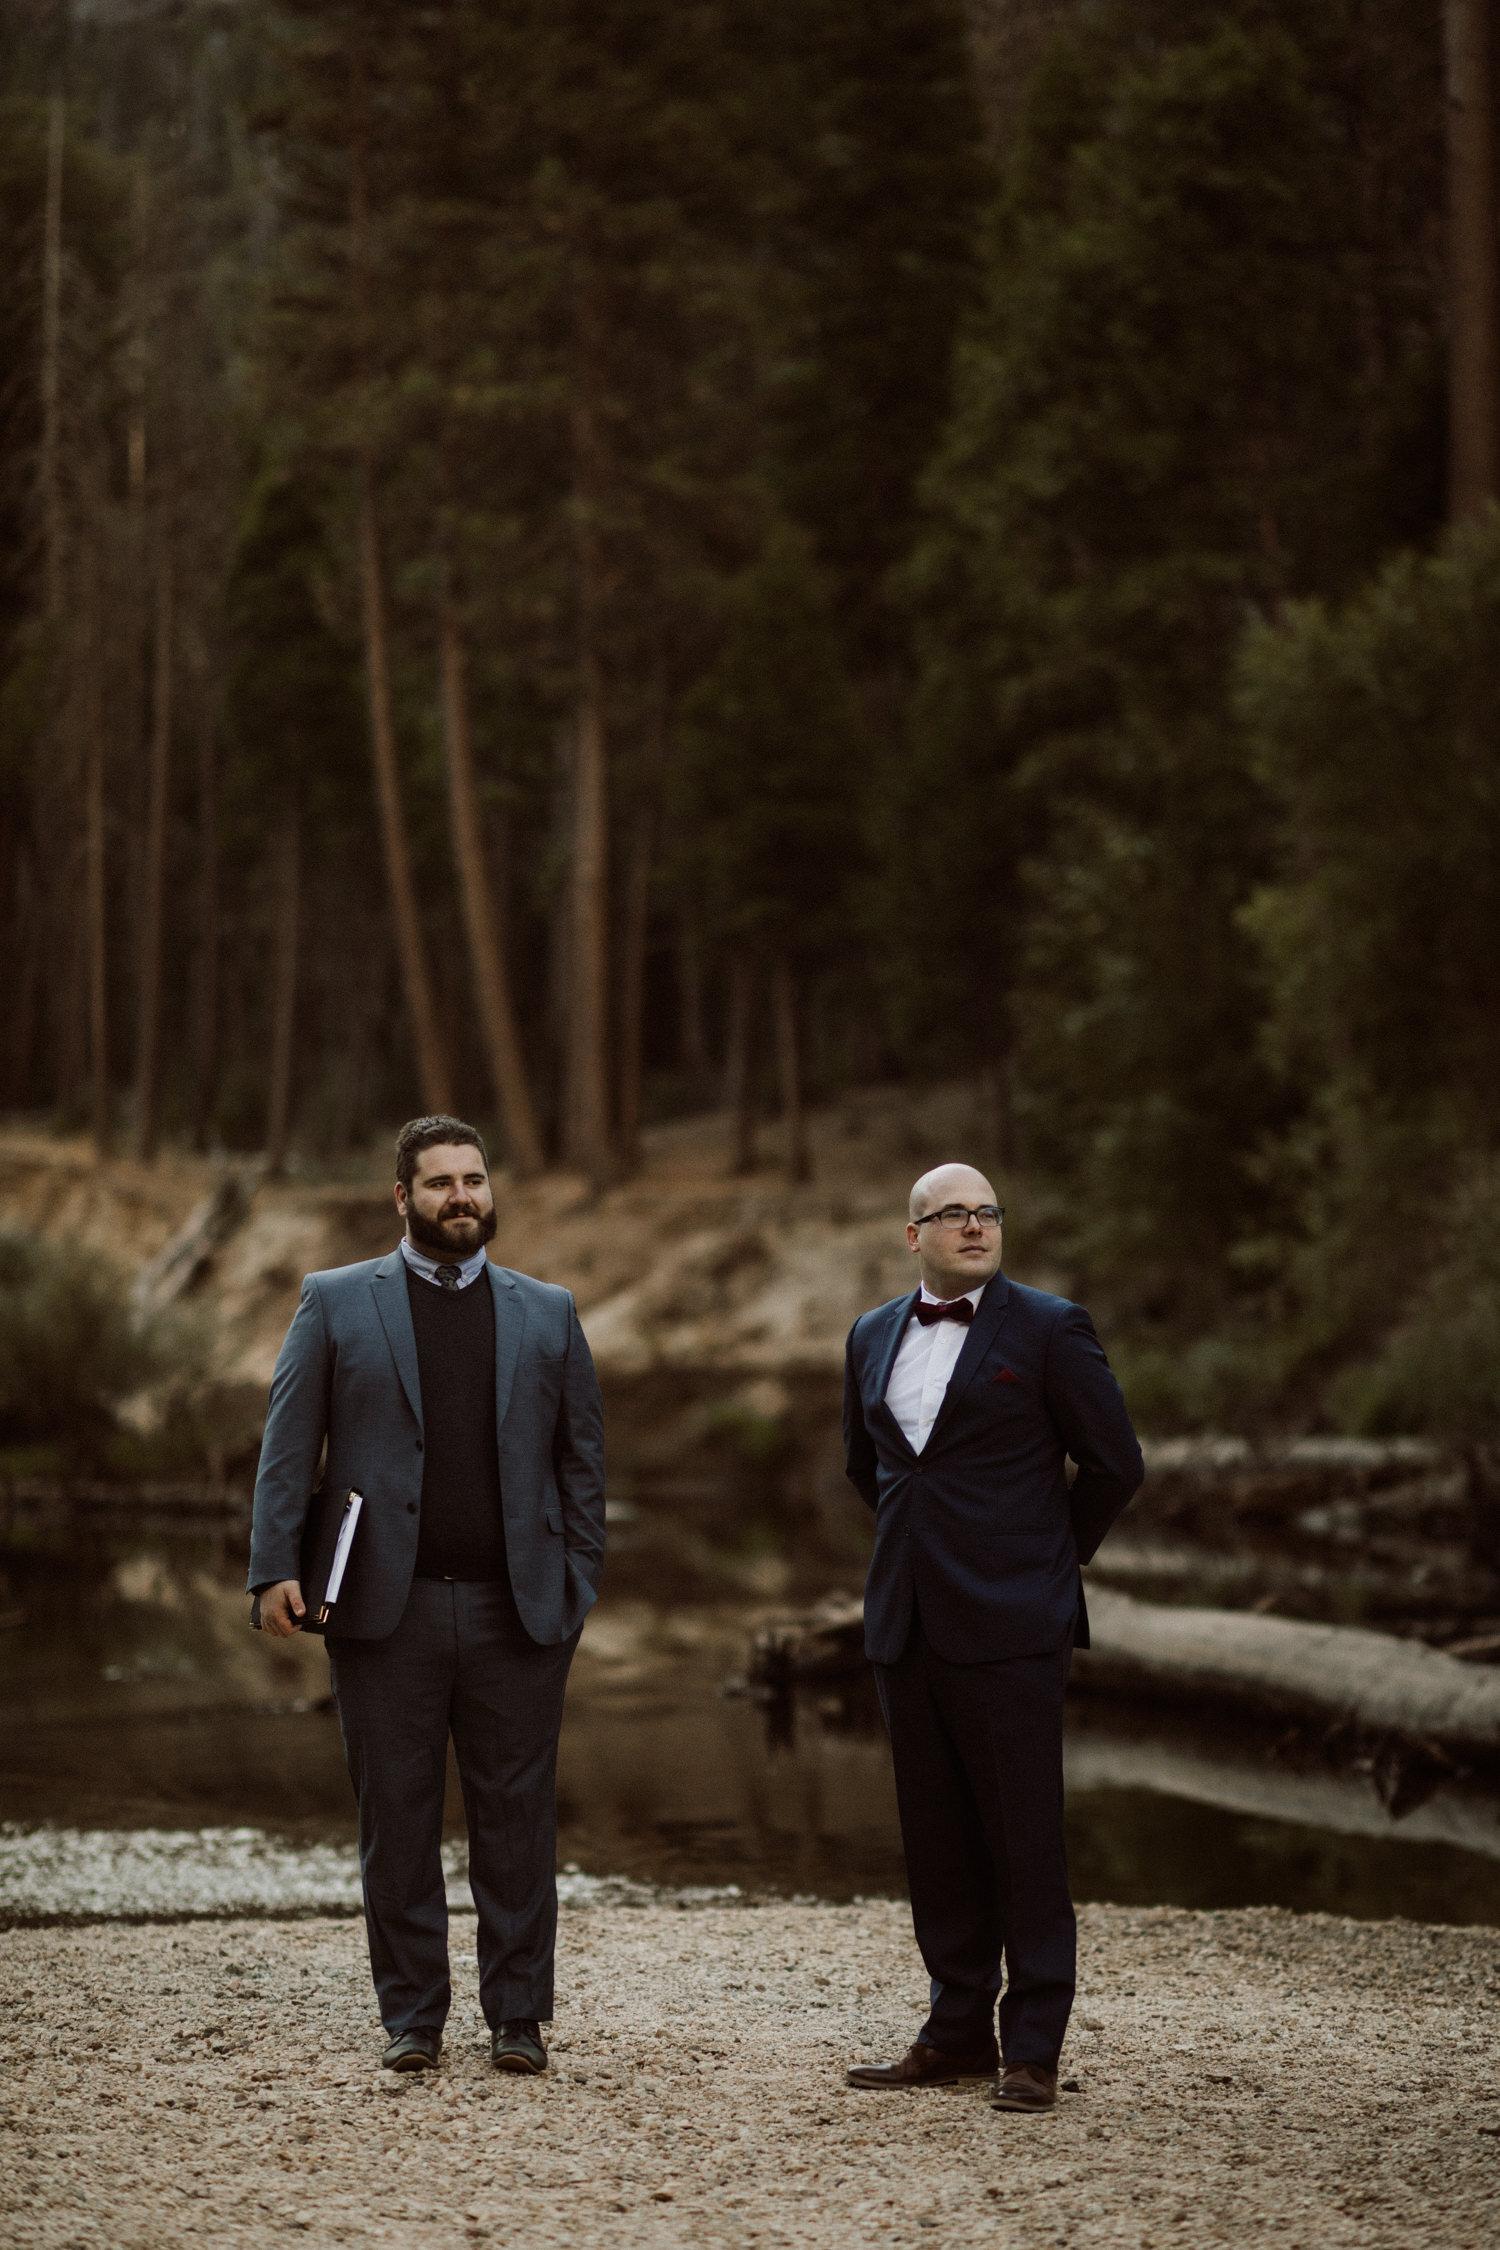 adventure-wedding-yosemite-national-park-13.jpg